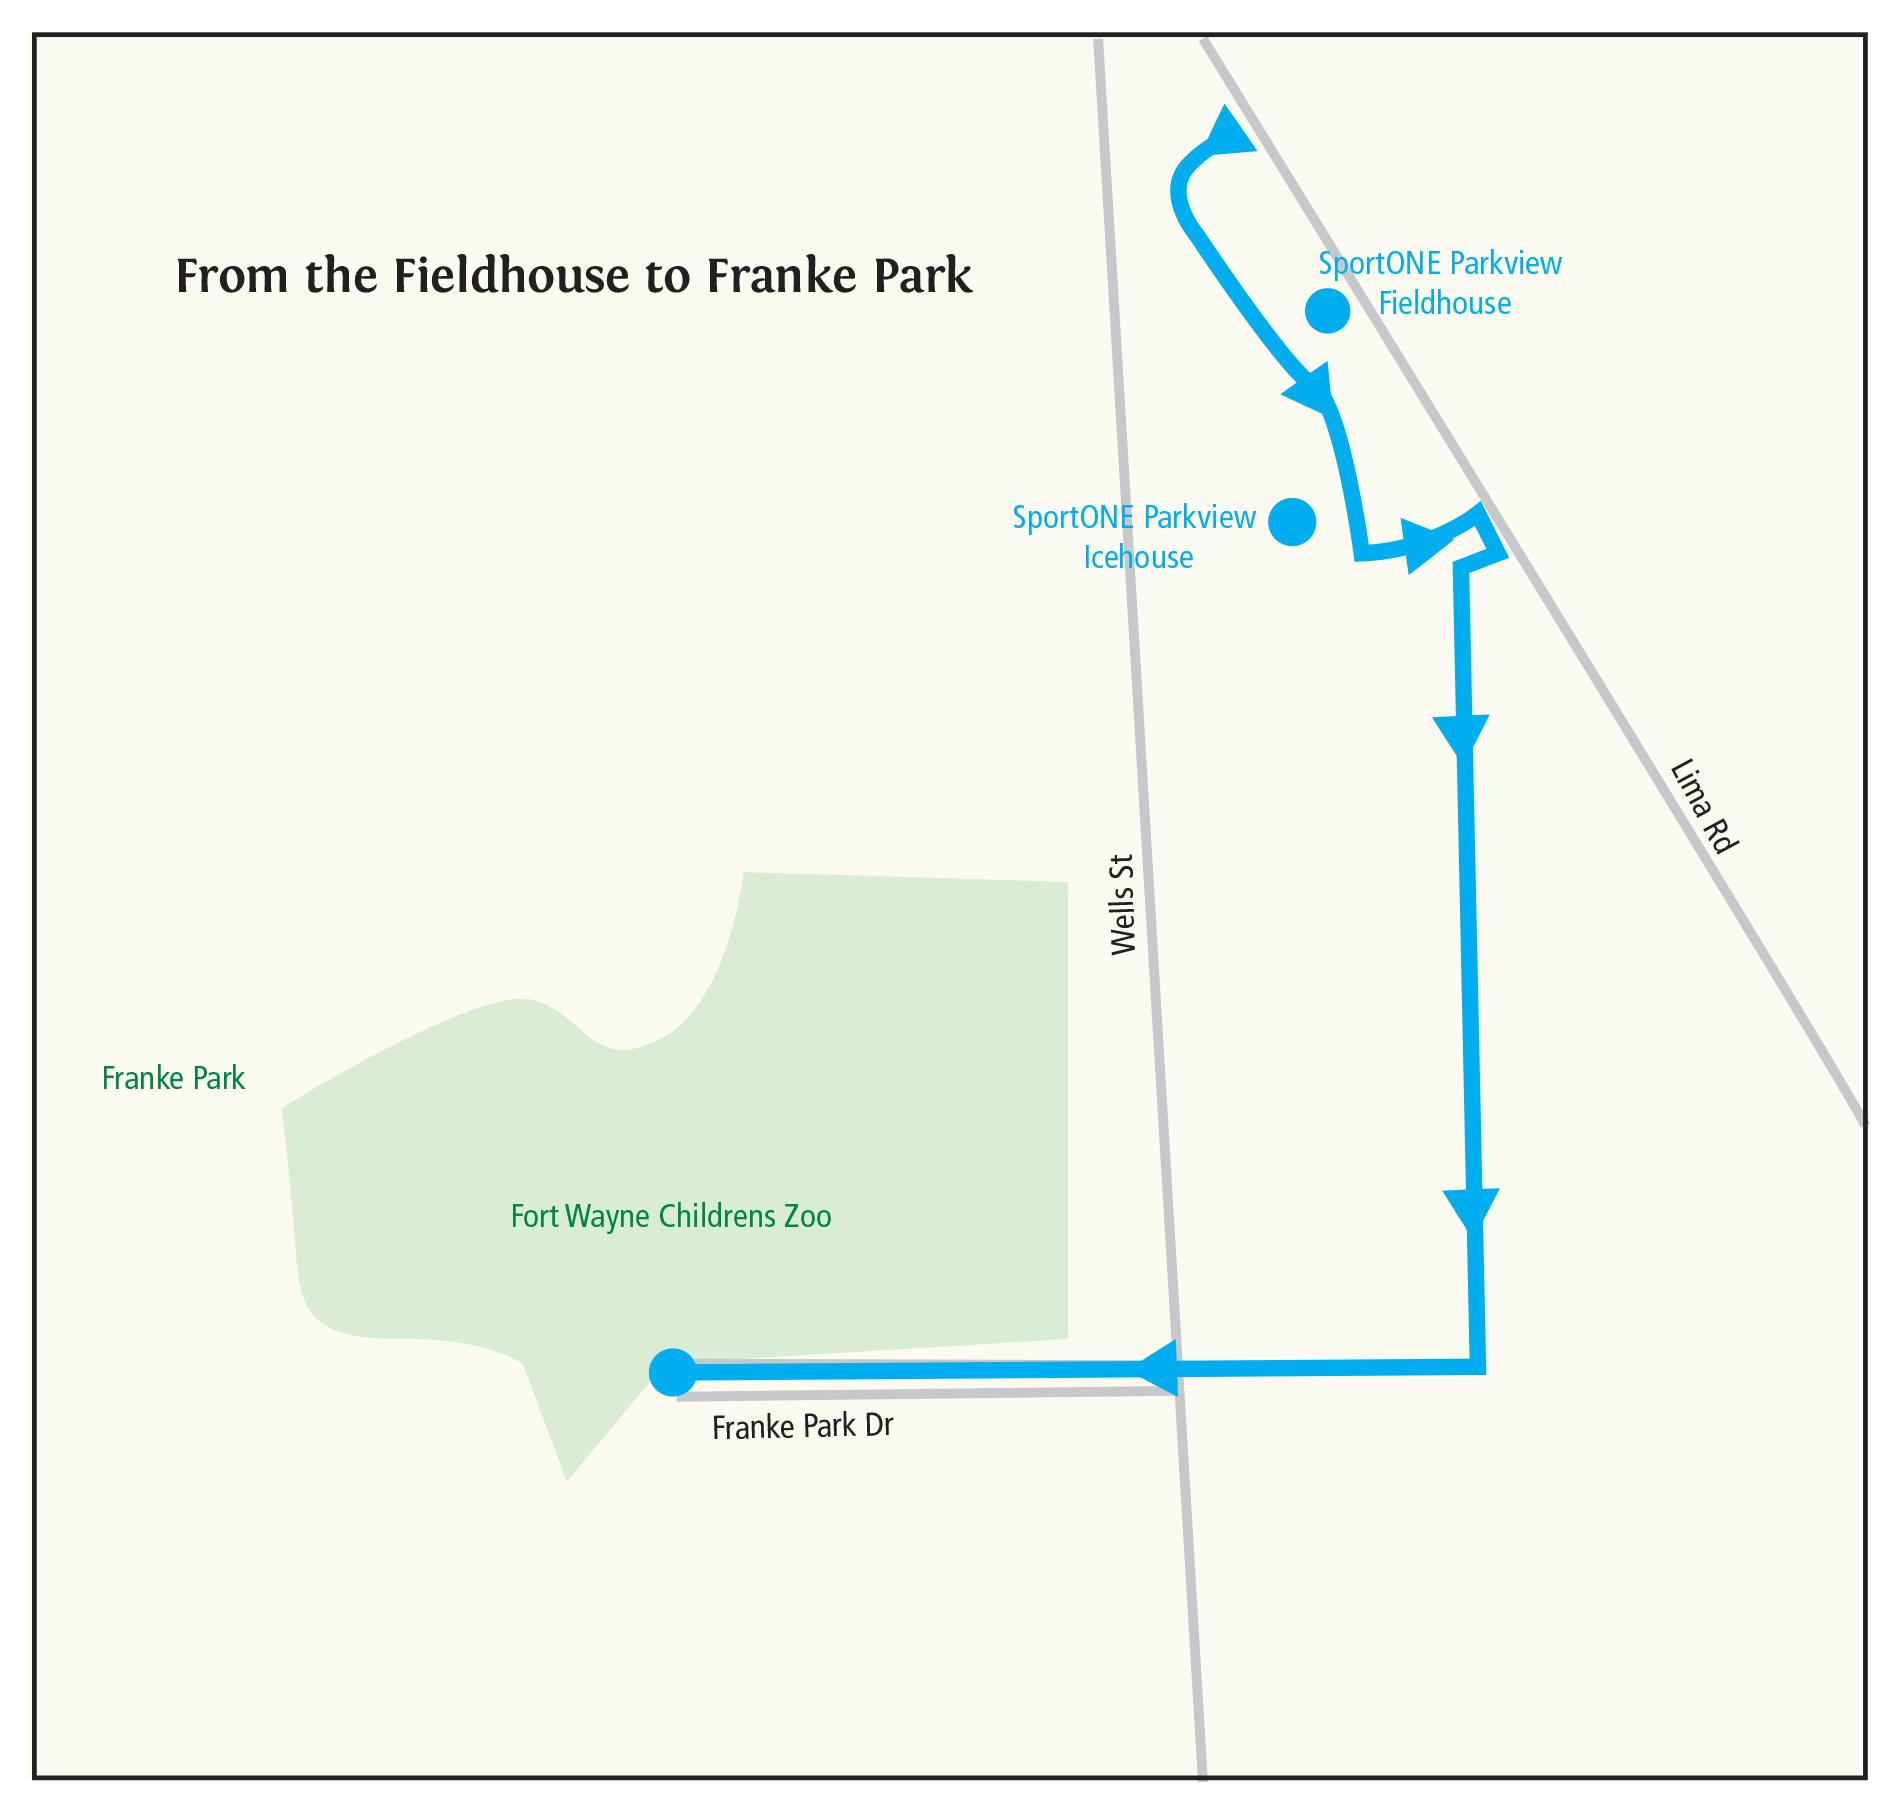 Map Of Wayne County Pa, Fieldhouse To Franke Park Trail Ride Itinerary, Map Of Wayne County Pa